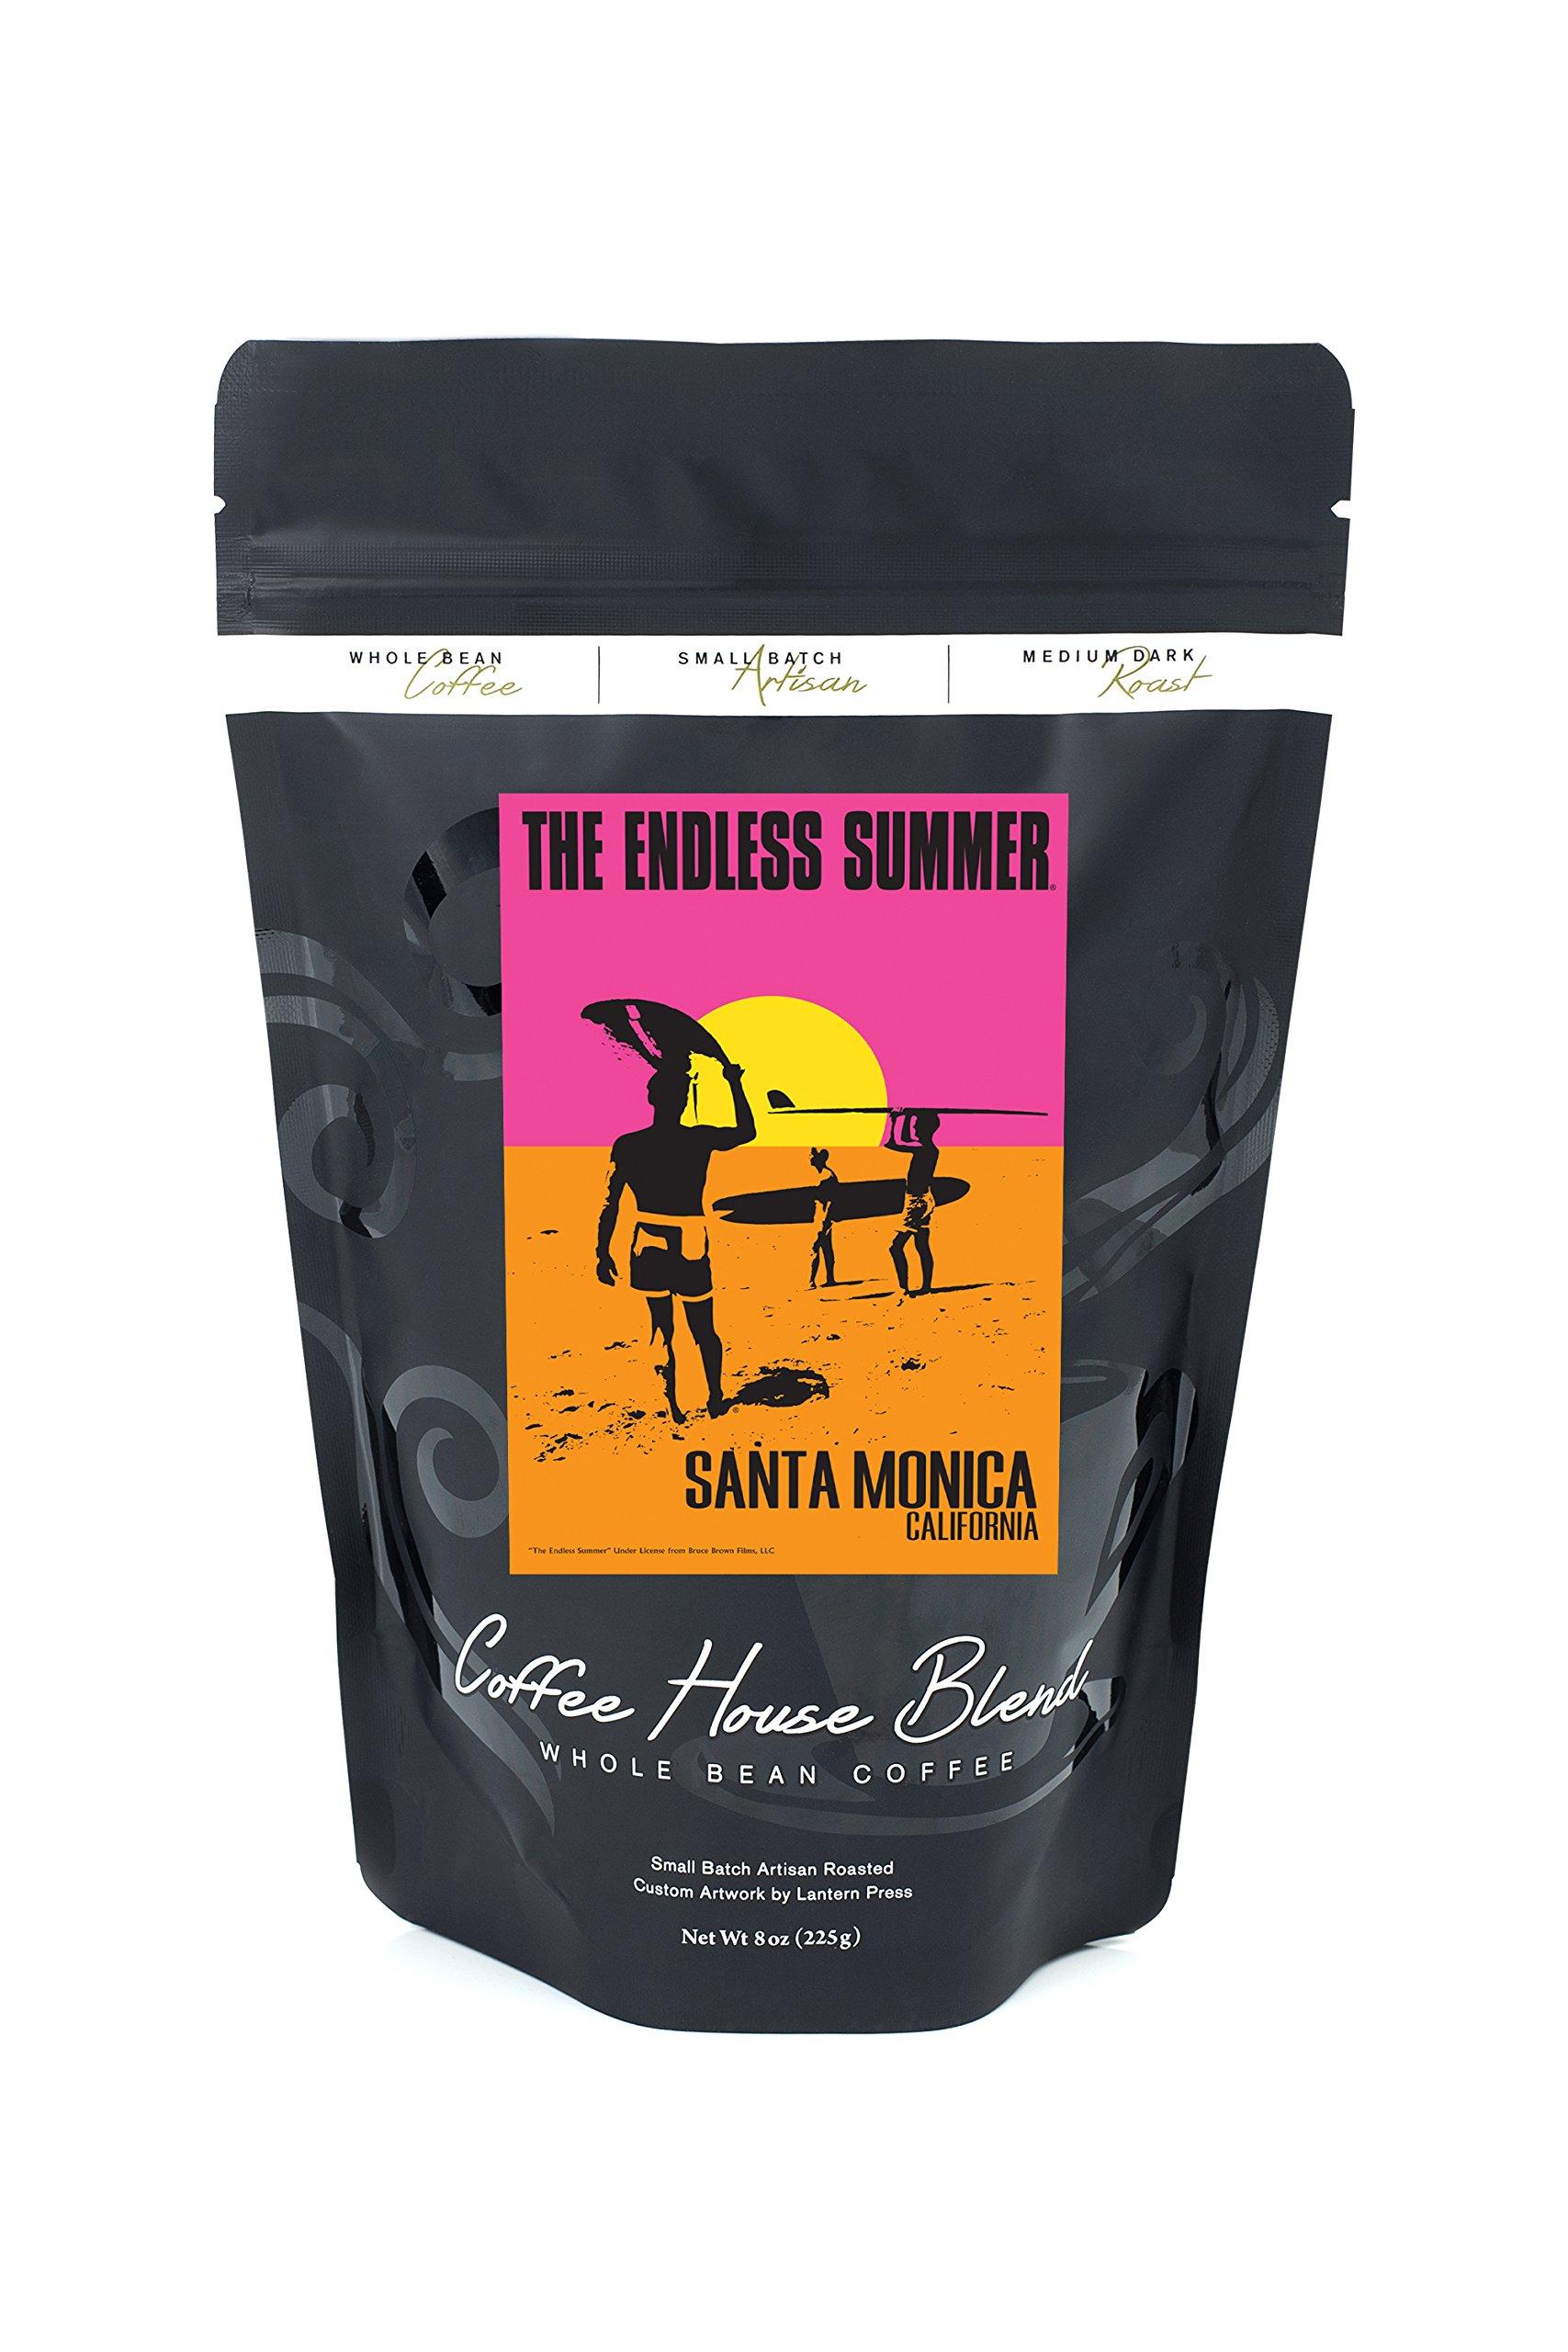 Santa Monica, California - The Endless Summer - Original Movie Poster (8oz Whole Bean Small Batch Artisan Coffee - Bold & Strong Medium Dark Roast w/ Artwork)